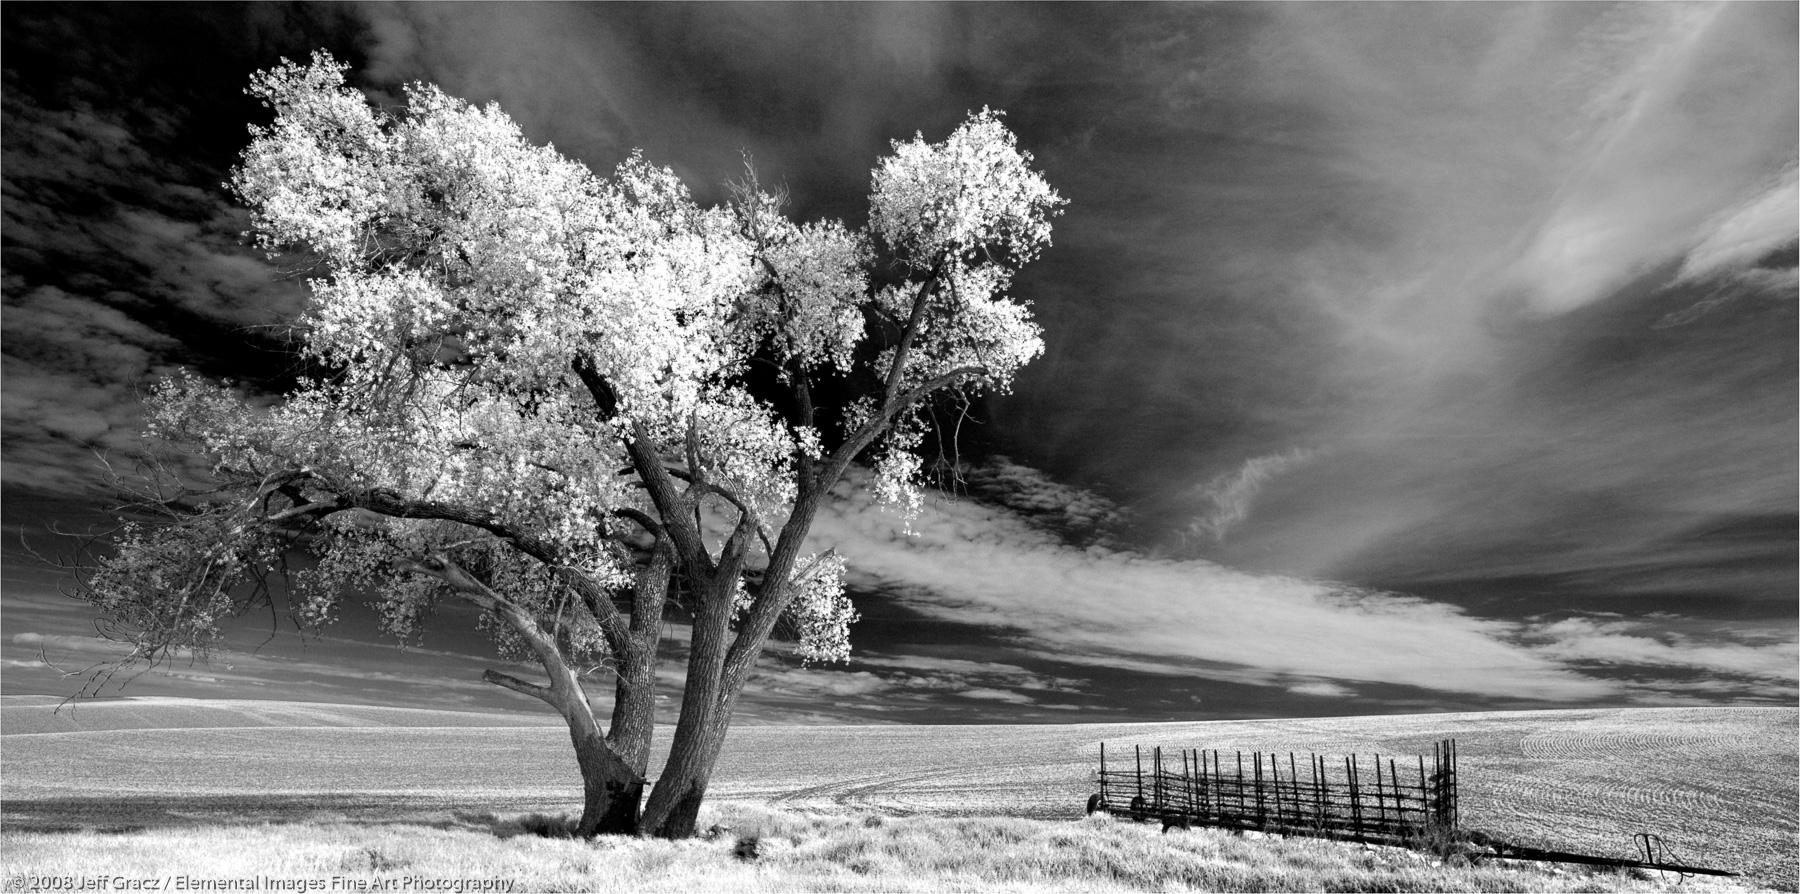 Lone Tree with Farm Machinery |  | WA | USA - © © 2008 Jeff Gracz / Elemental Images Fine Art Photography - All Rights Reserved Worldwide